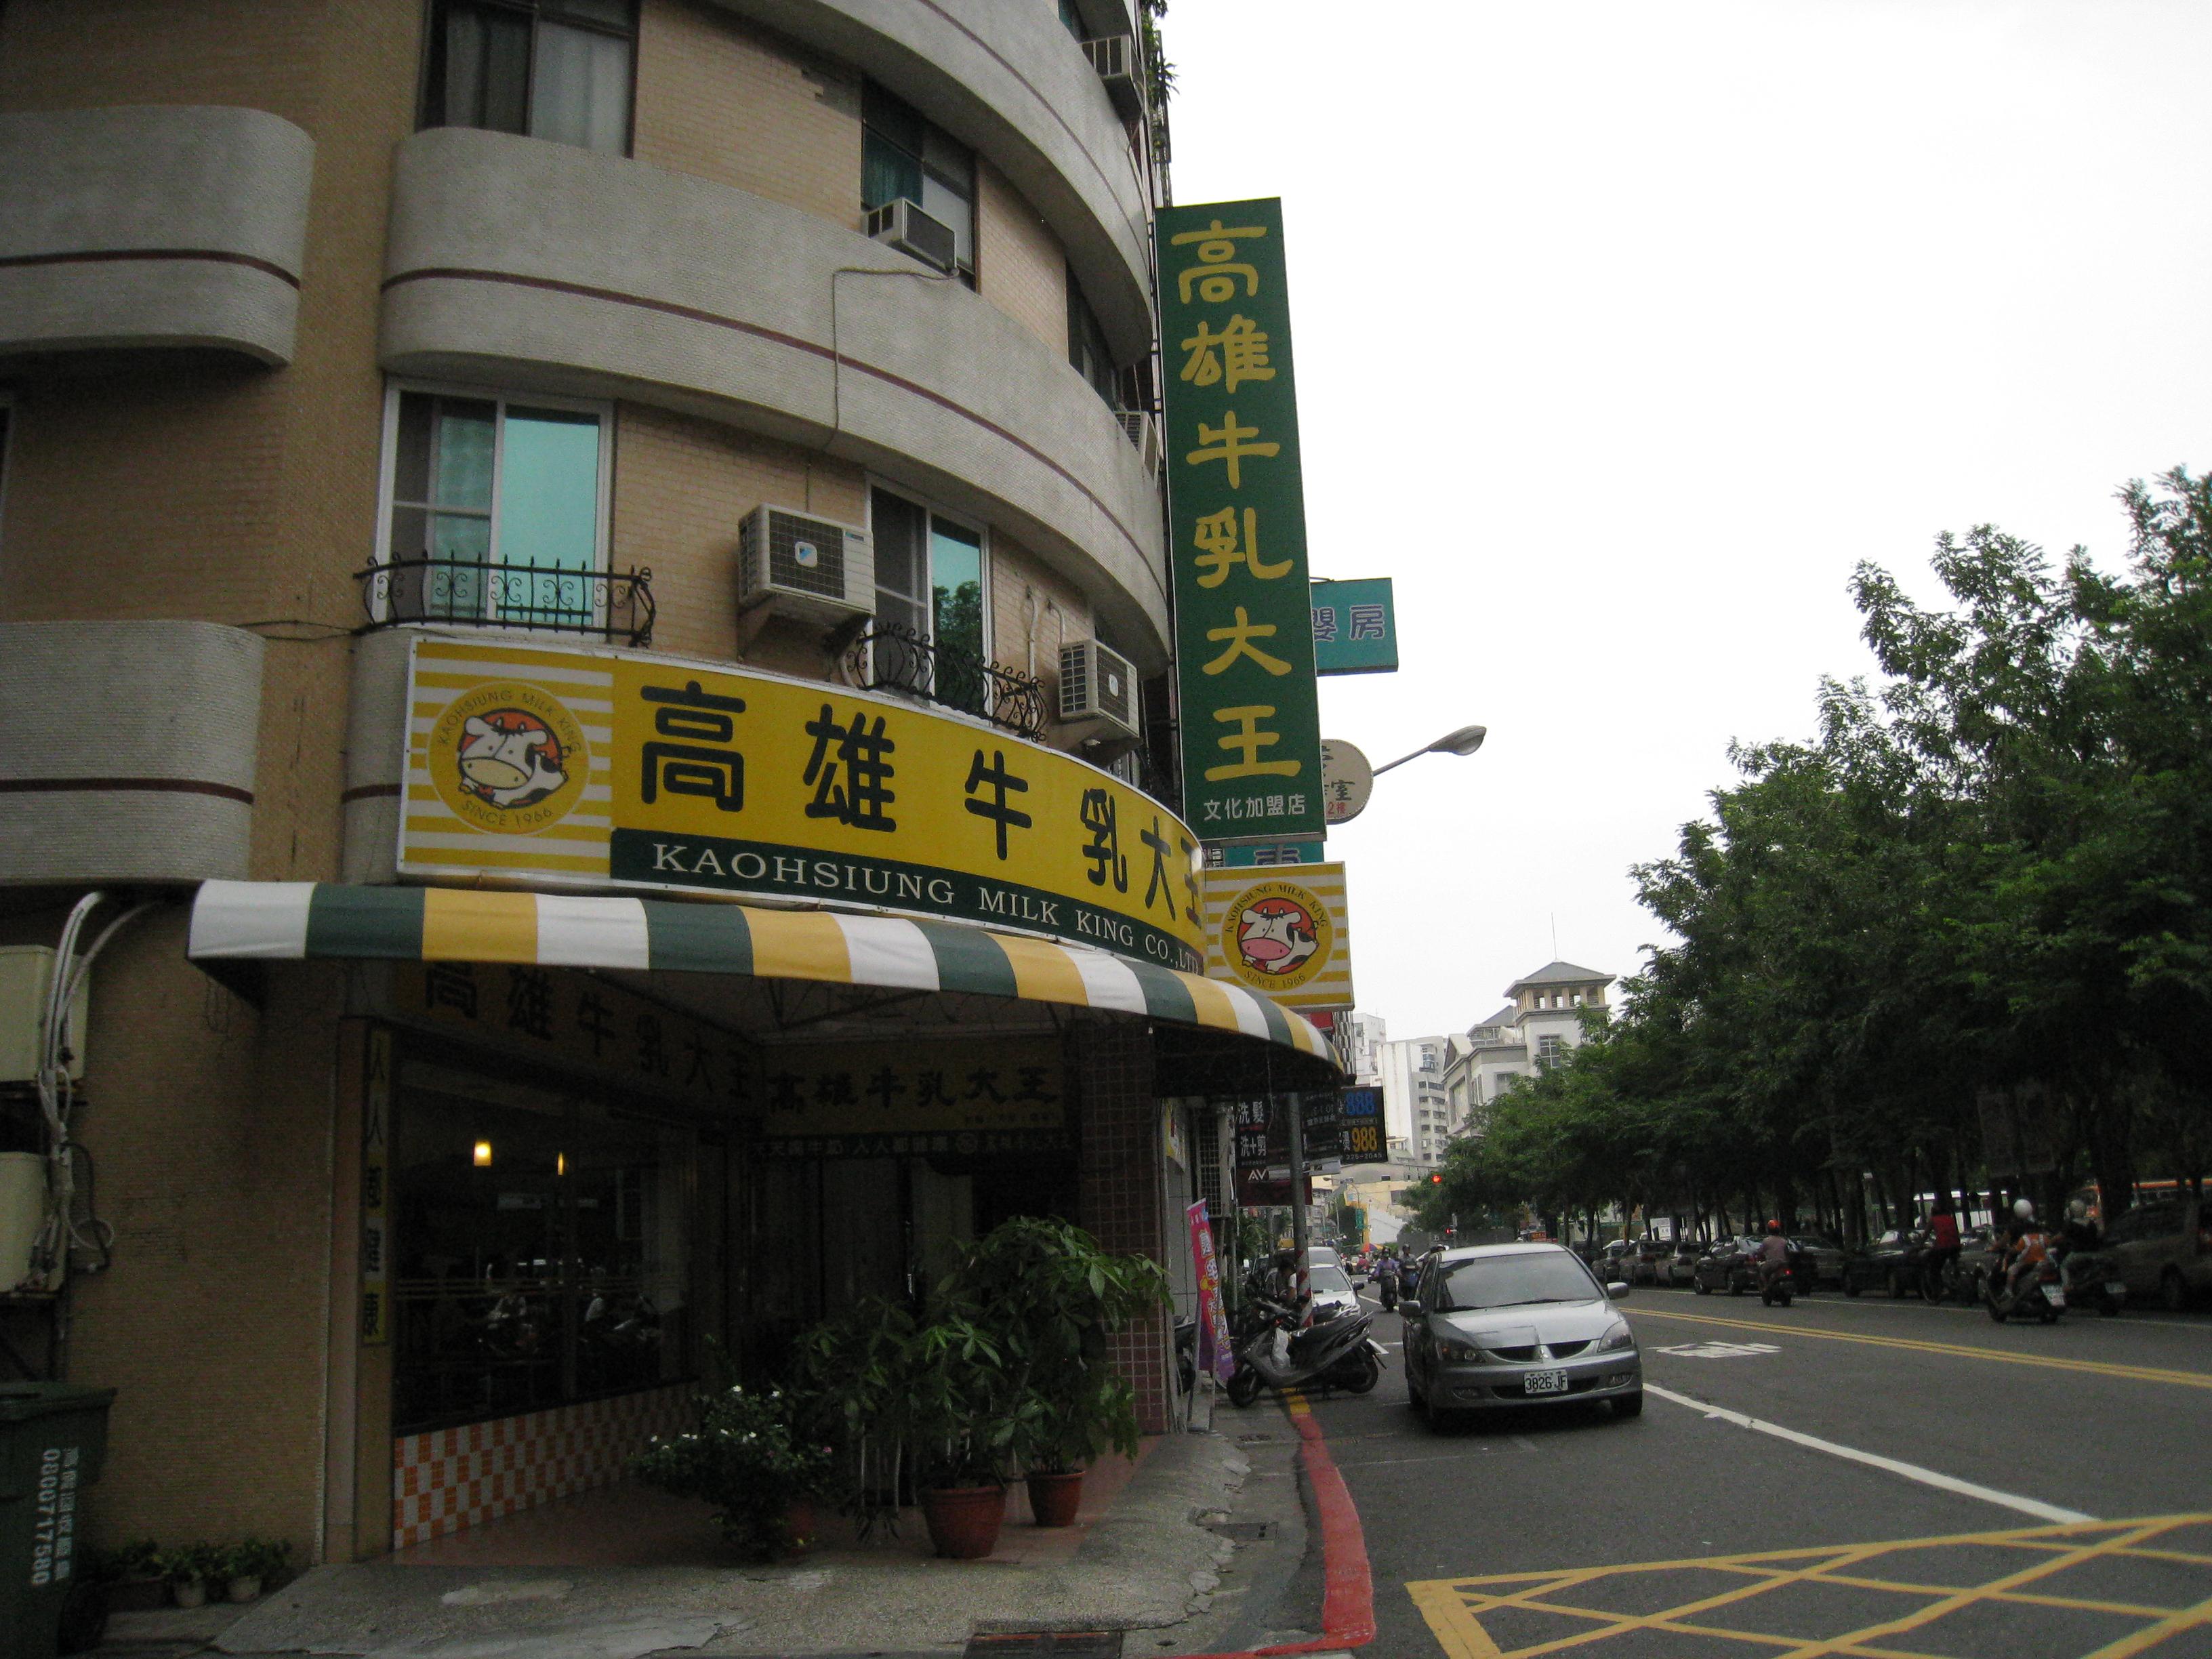 kaohsiung milk king